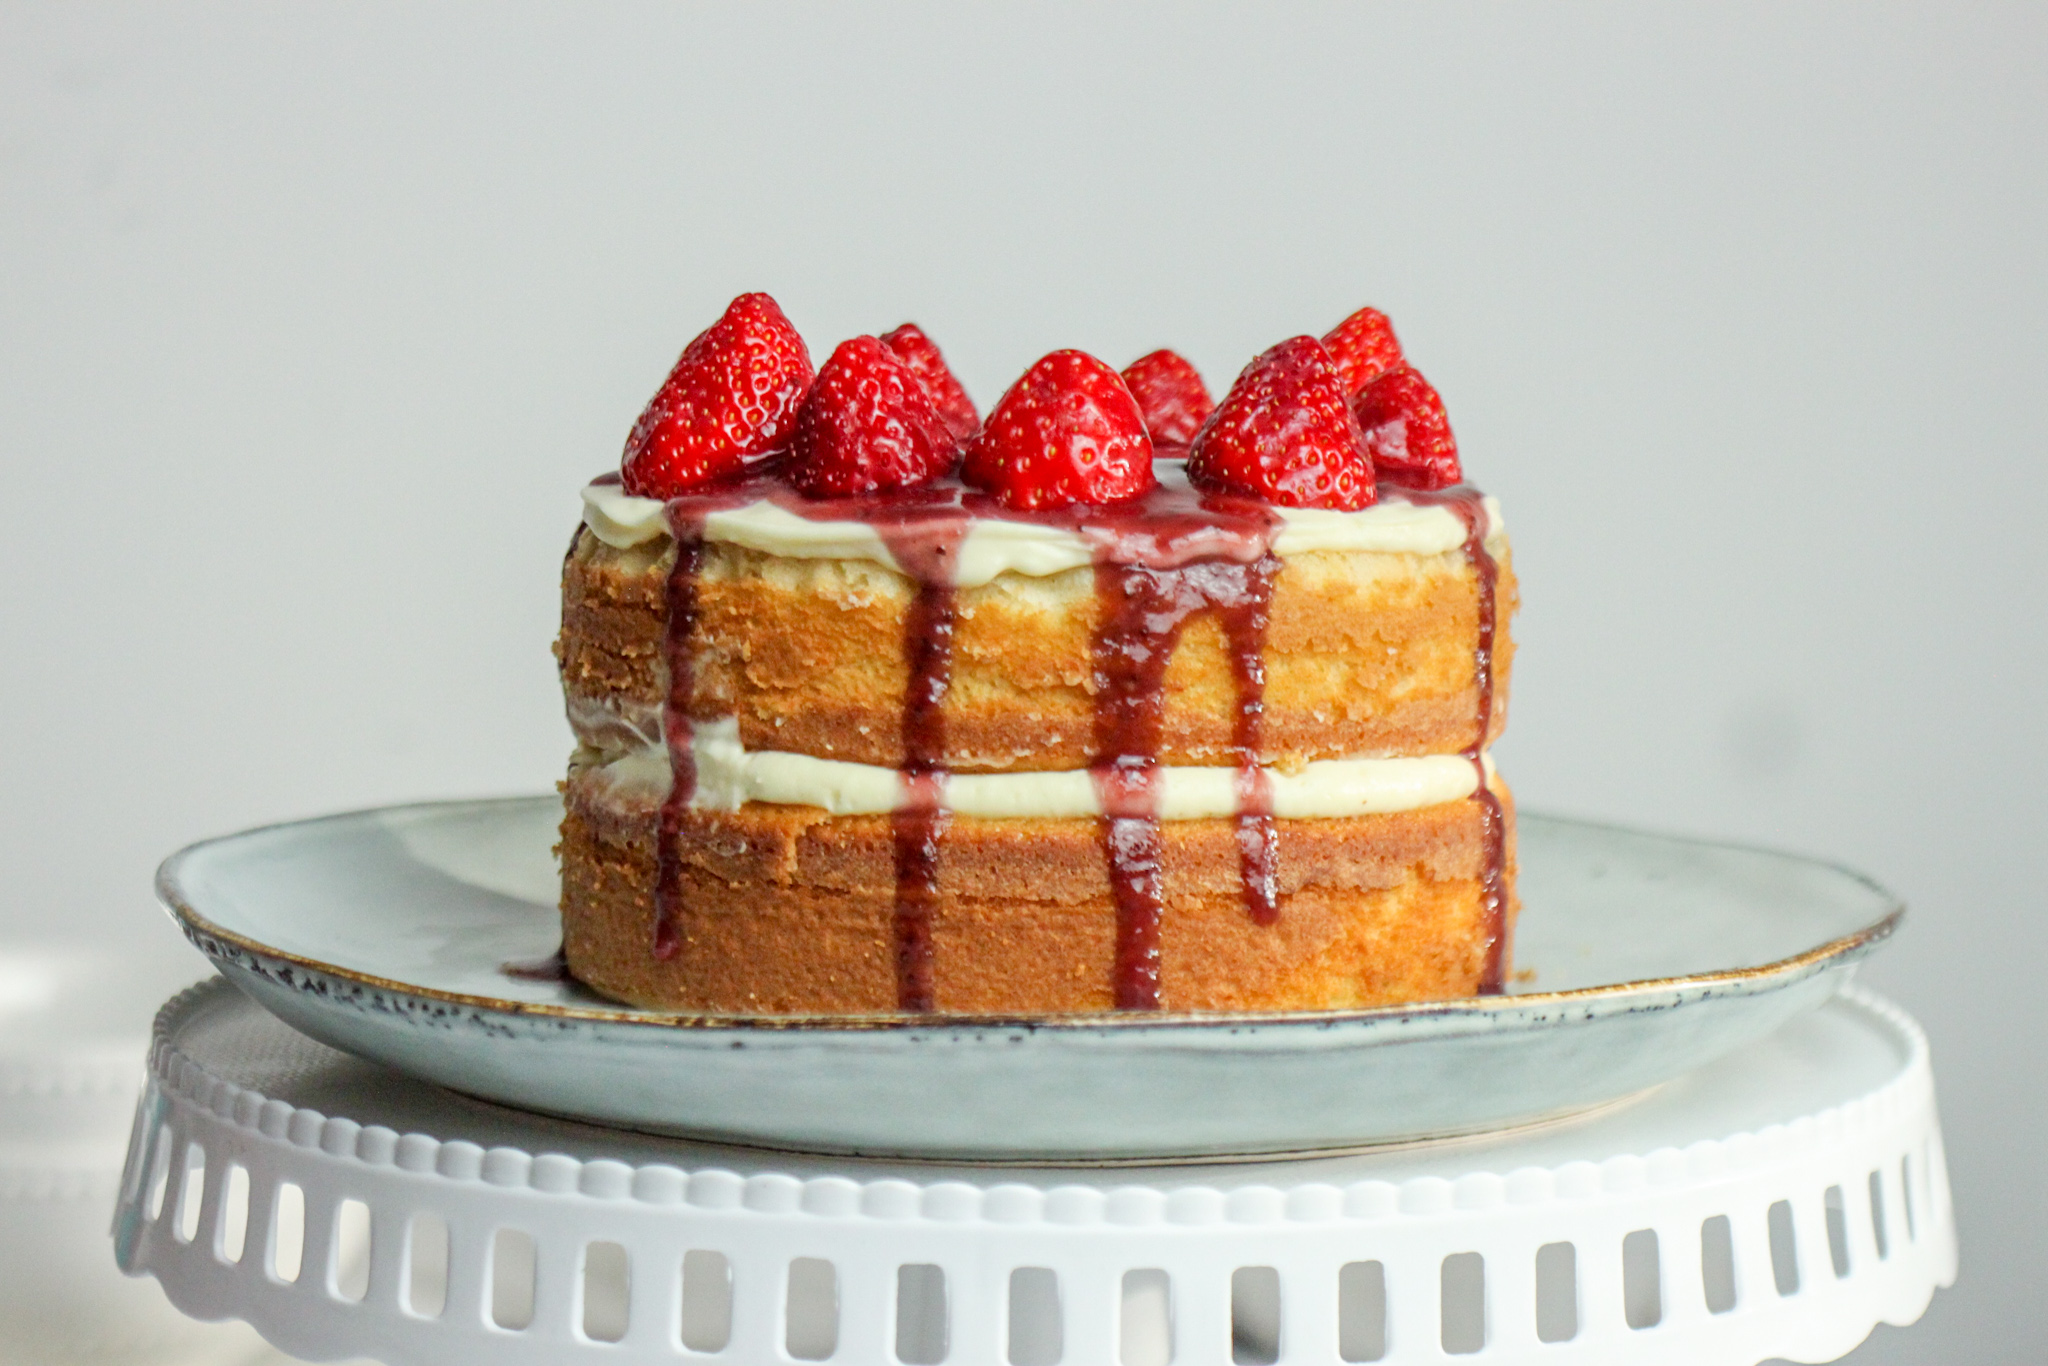 How to Make a Simple Lemon Strawberry Cream Naked Cake